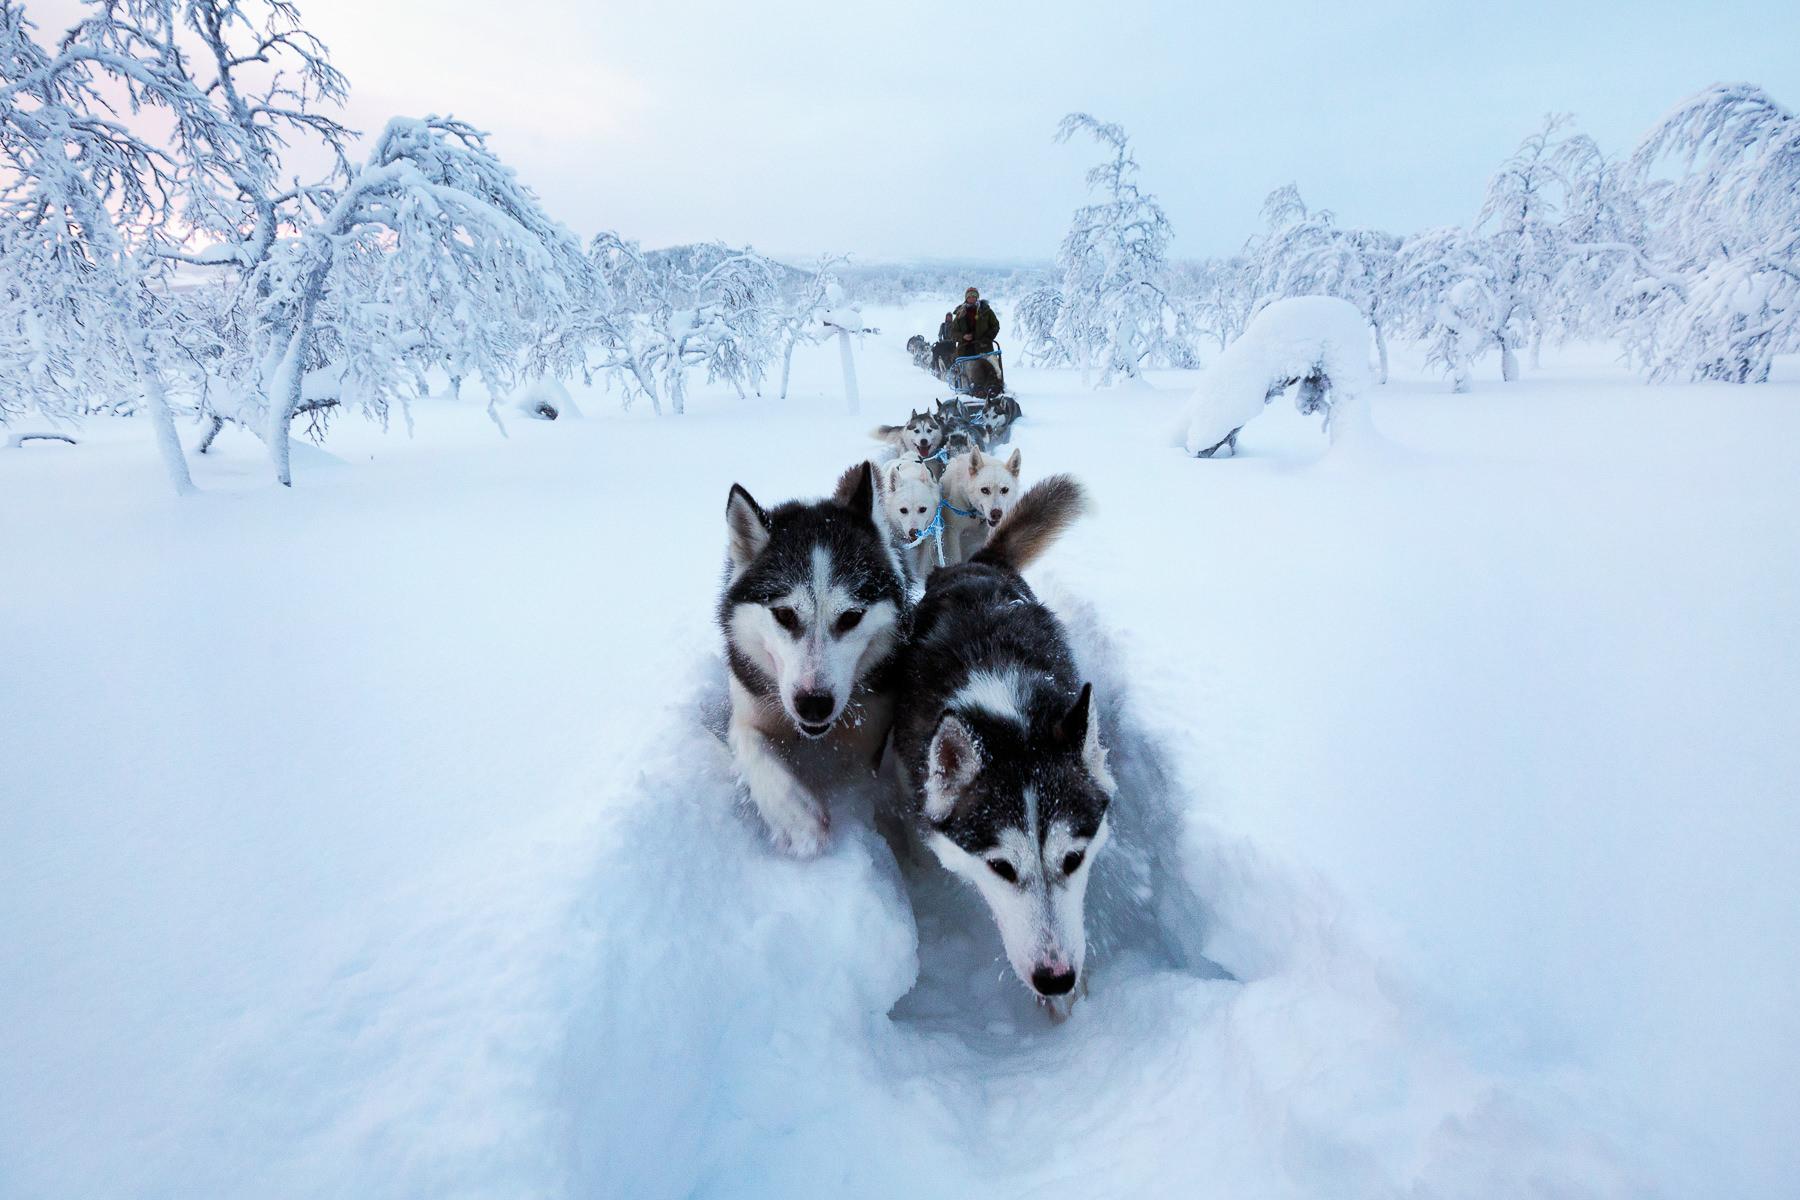 Briceportolano_Finland_22_WEB.jpg